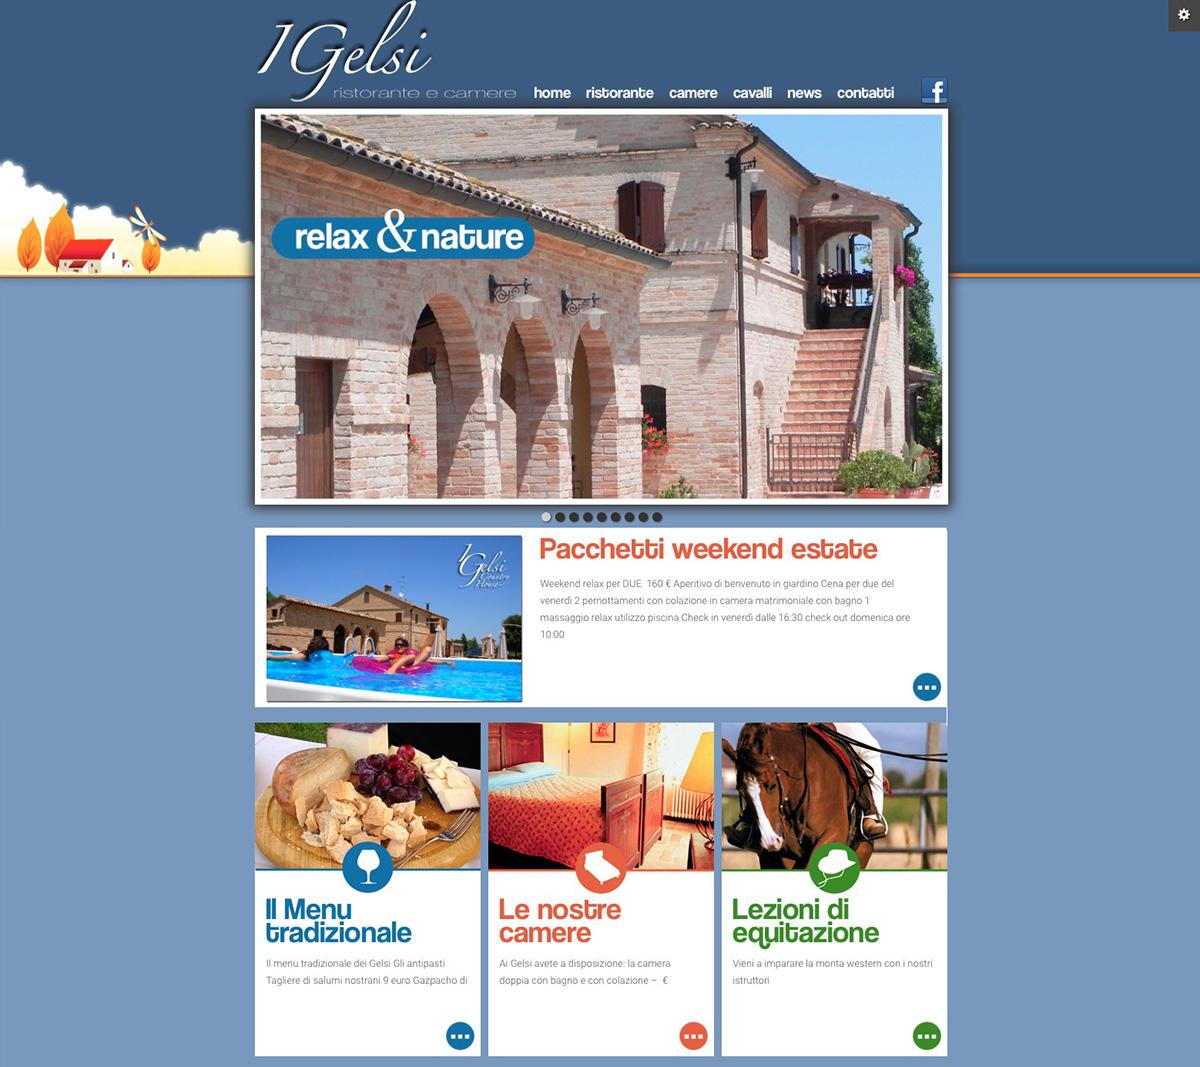 sito web Responsive wordpress agriturismo ristorante